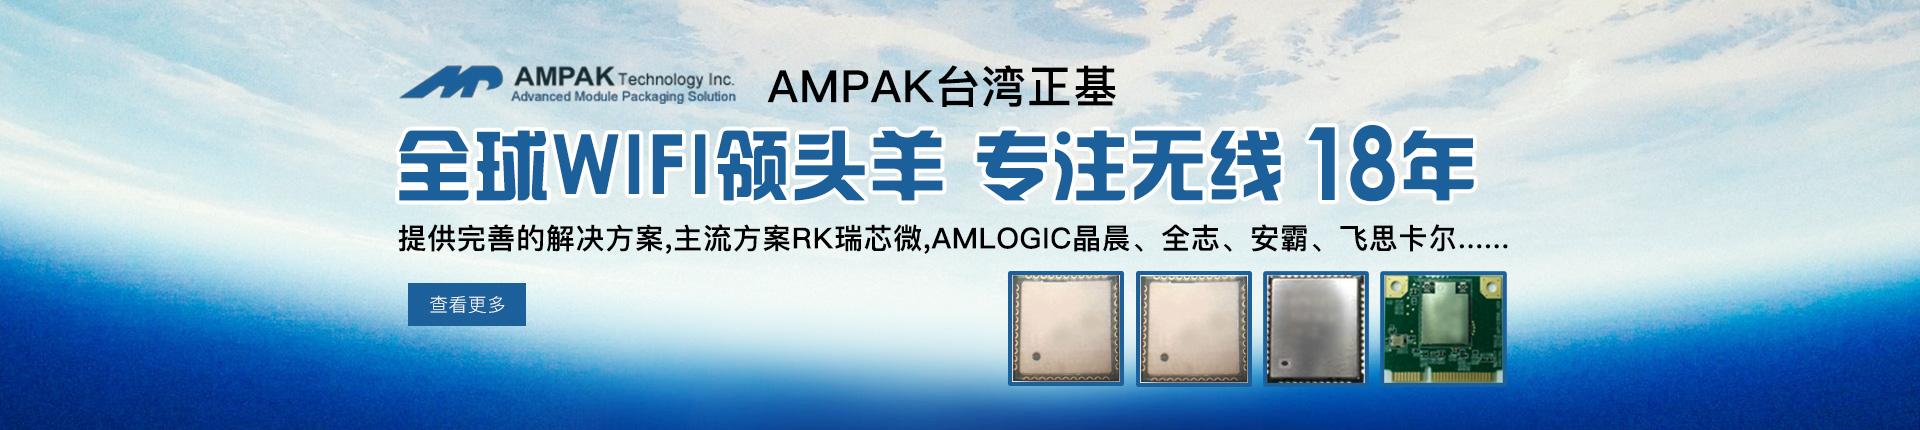 AMPAK正基授权代理,AMPAK大陆代理商正基厂家授权一级代理商